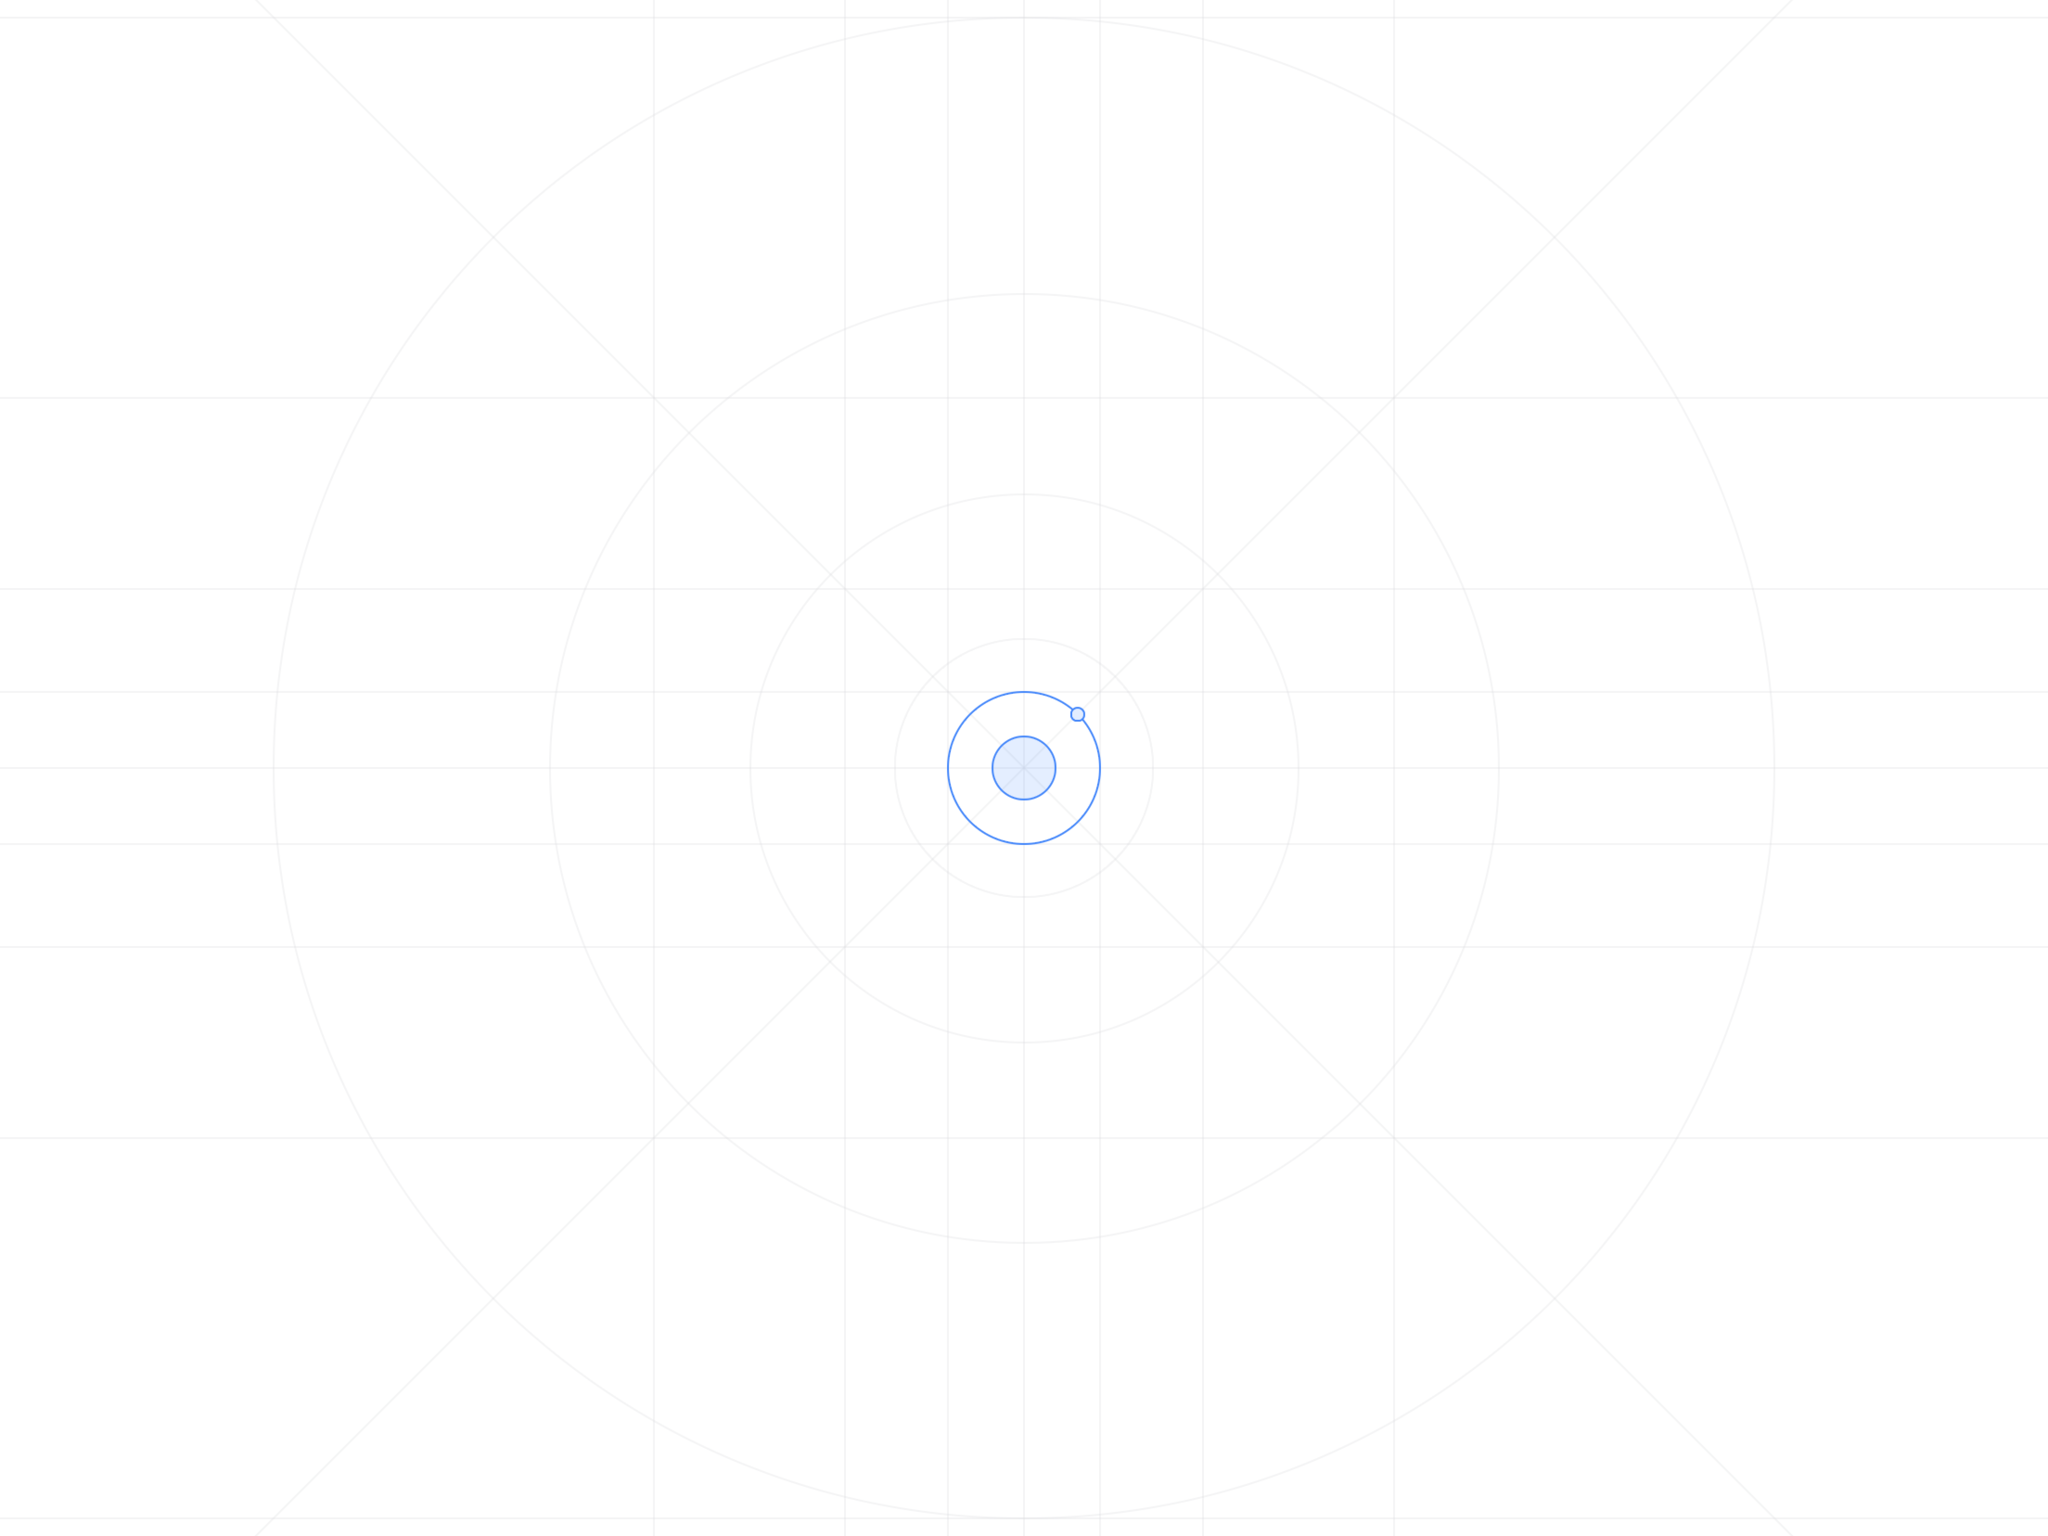 klu5/resources/ios/splash/Default-Landscape@2x~ipad.png